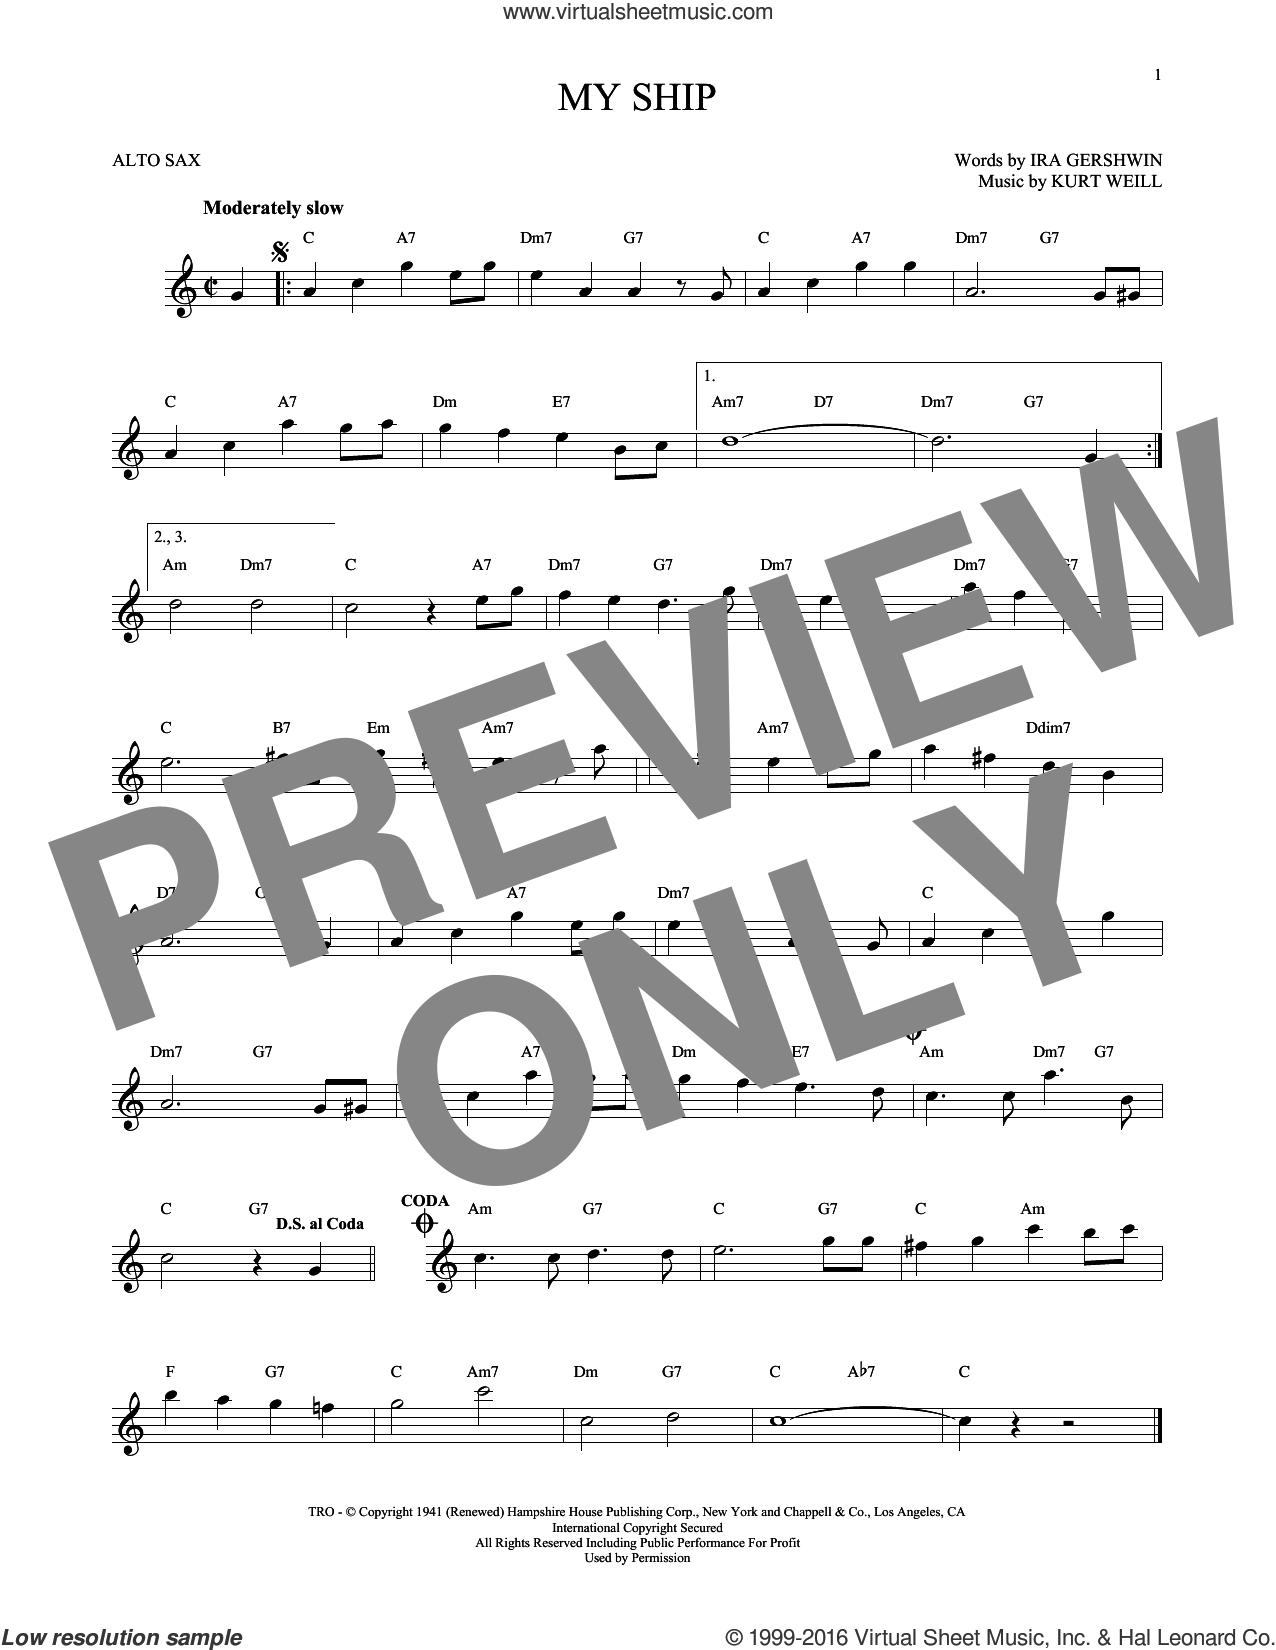 My Ship sheet music for alto saxophone solo by Ira Gershwin and Kurt Weill, intermediate skill level